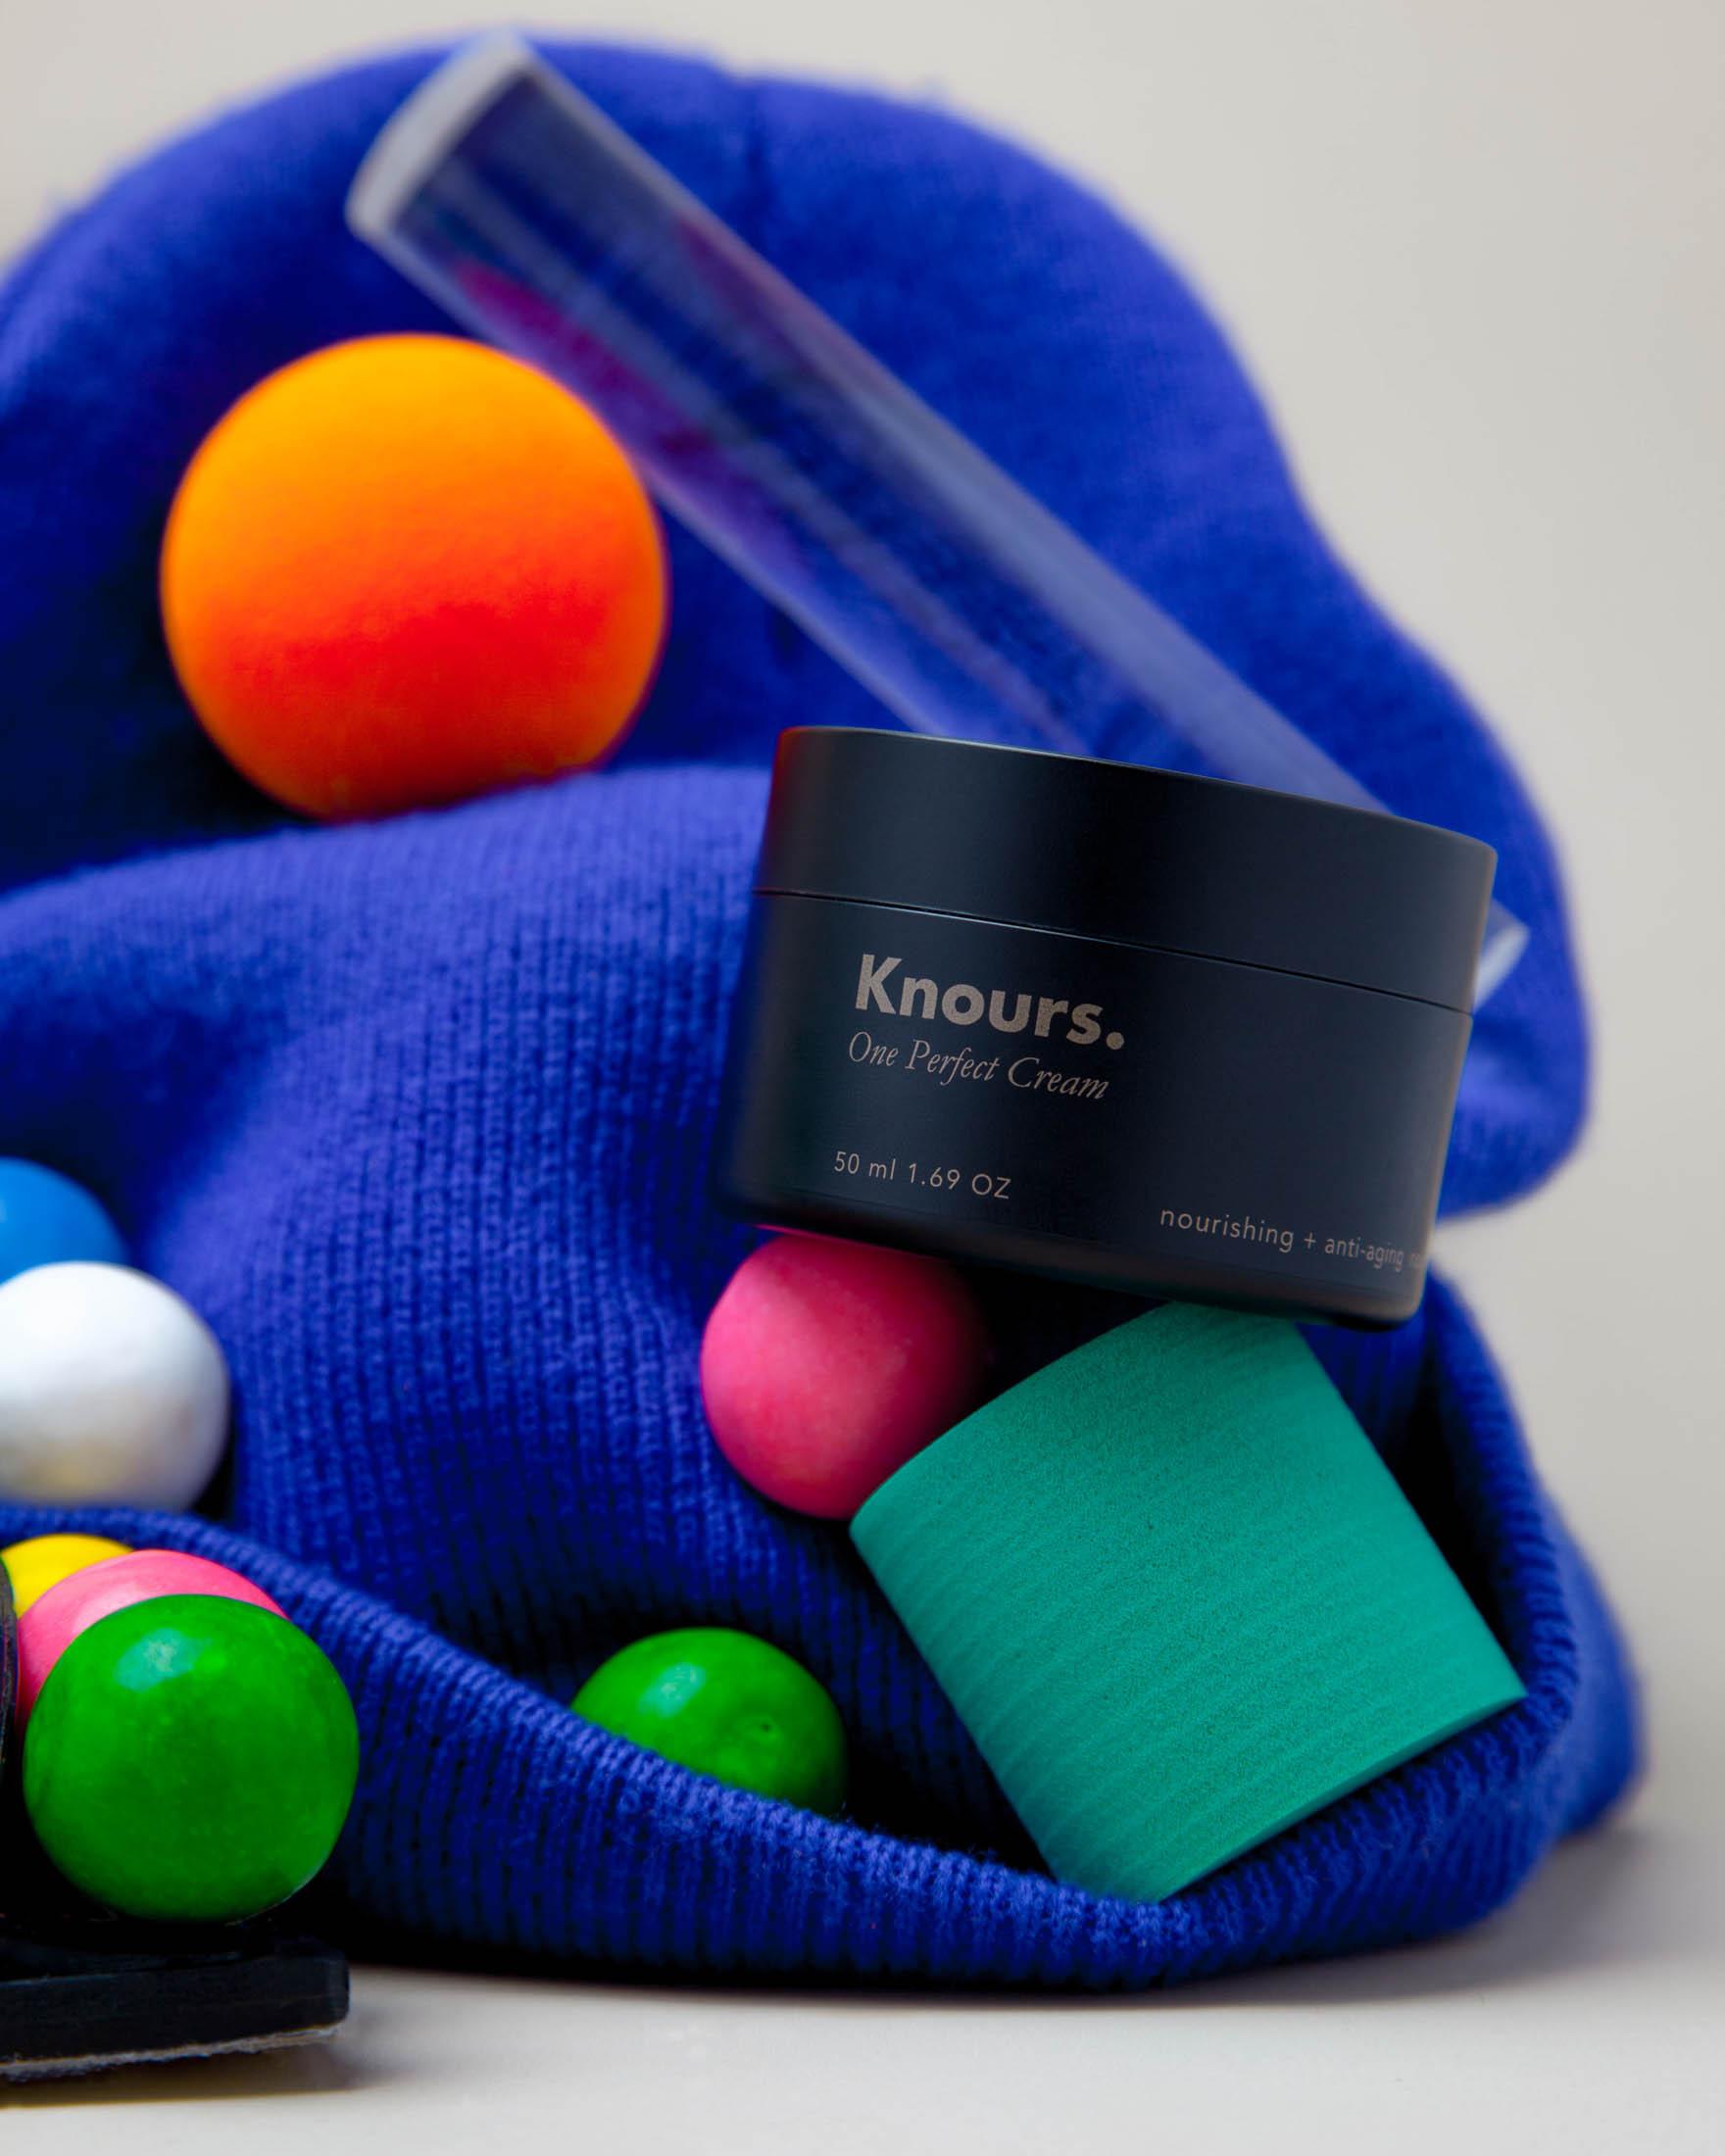 Knours2-201902240172-Edit.jpg